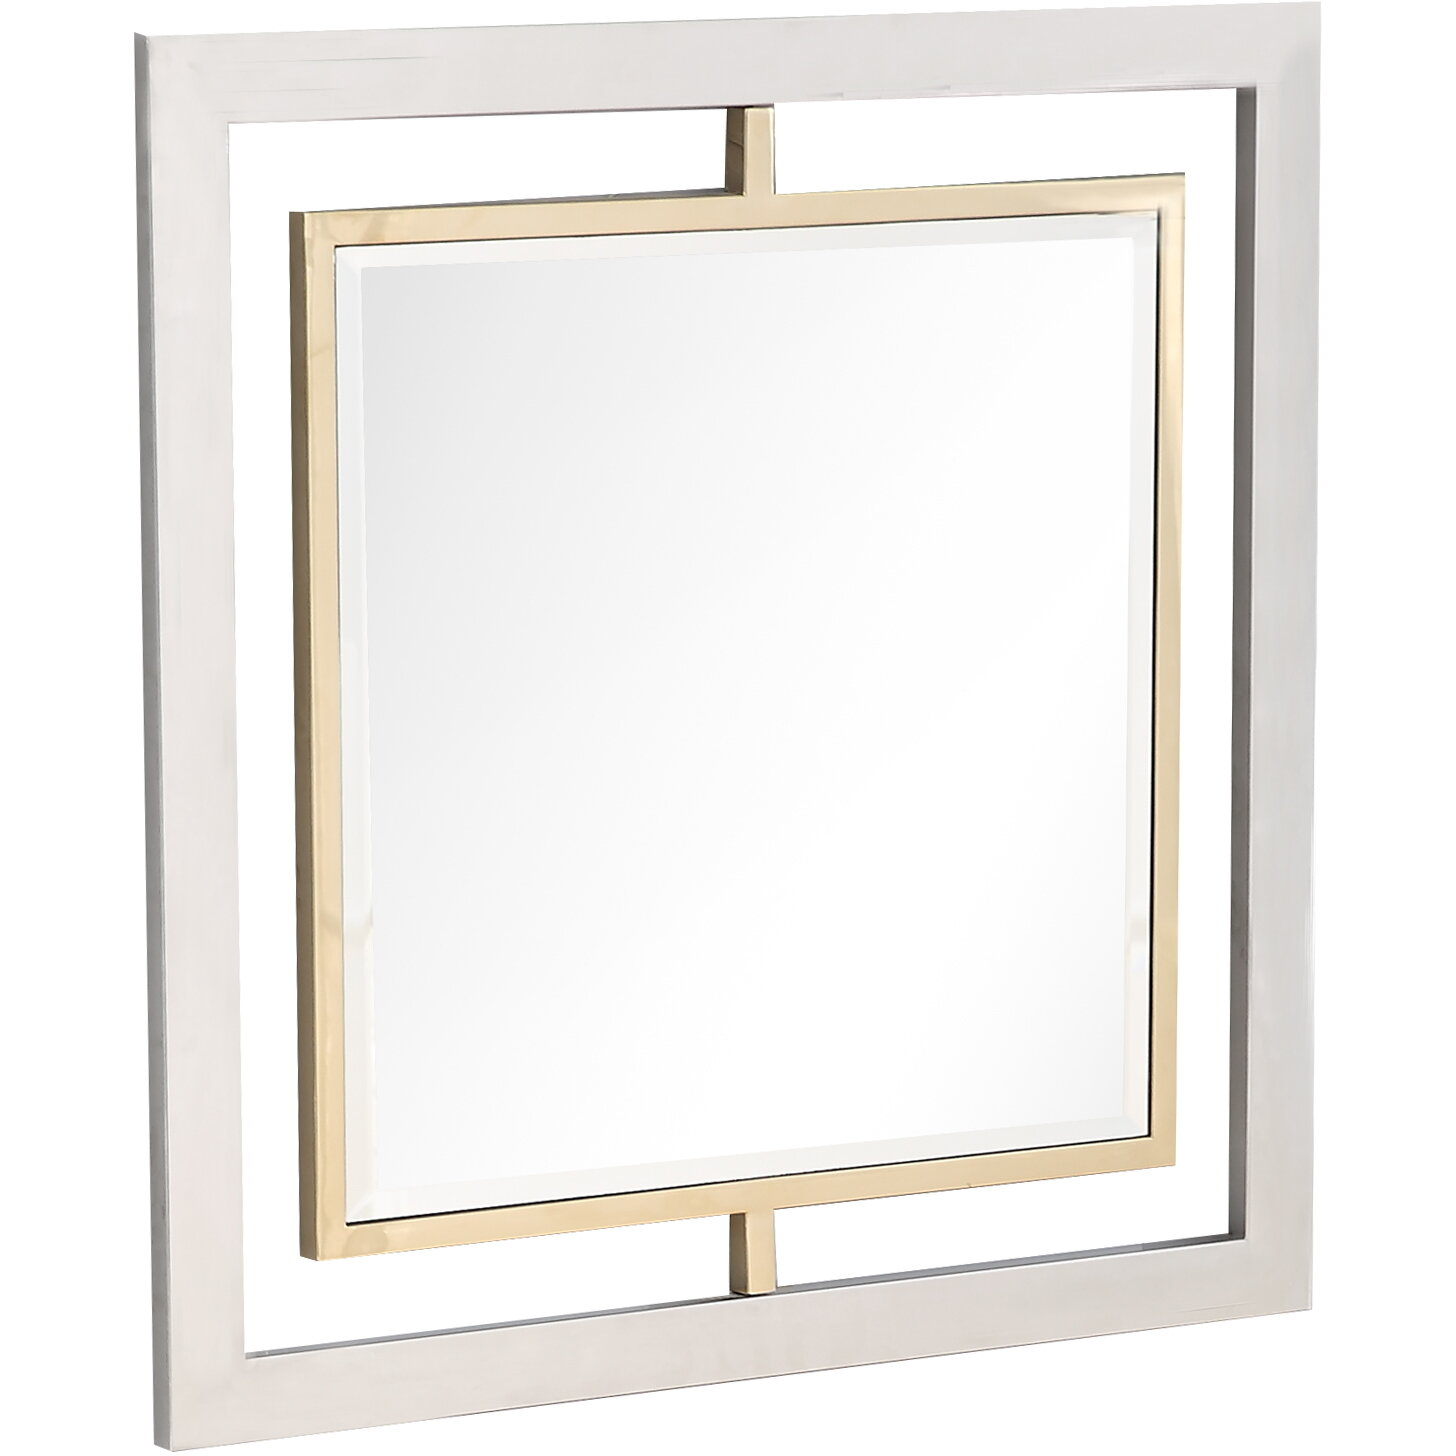 Everly Quinn Hoover Beveled Wall Mirror Wayfair